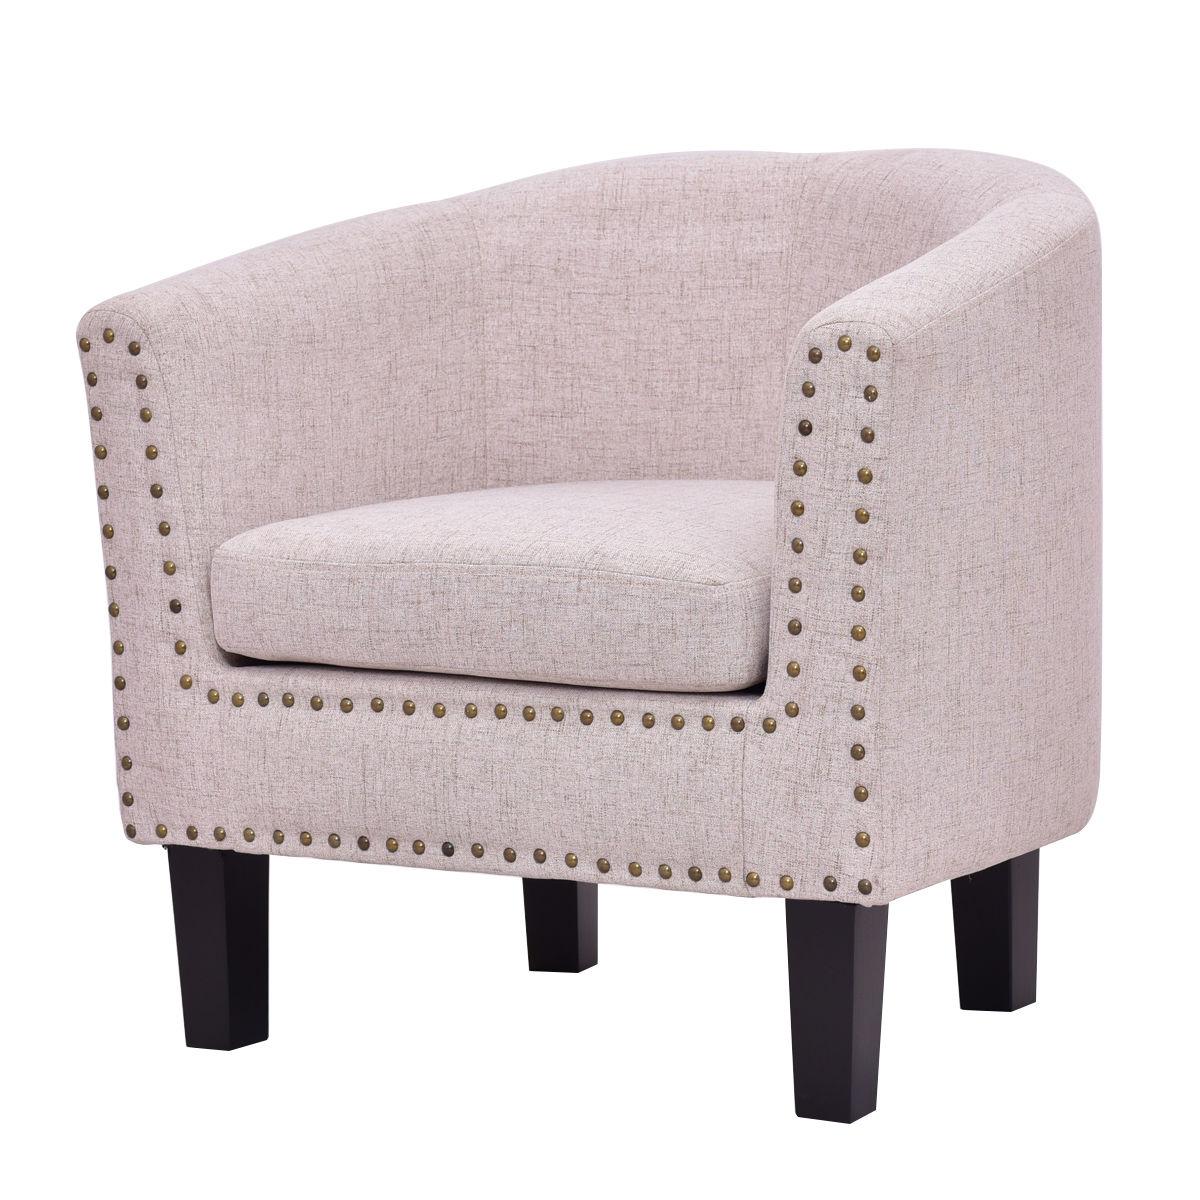 giantex modern living room armchair accent fabric rivets. Black Bedroom Furniture Sets. Home Design Ideas